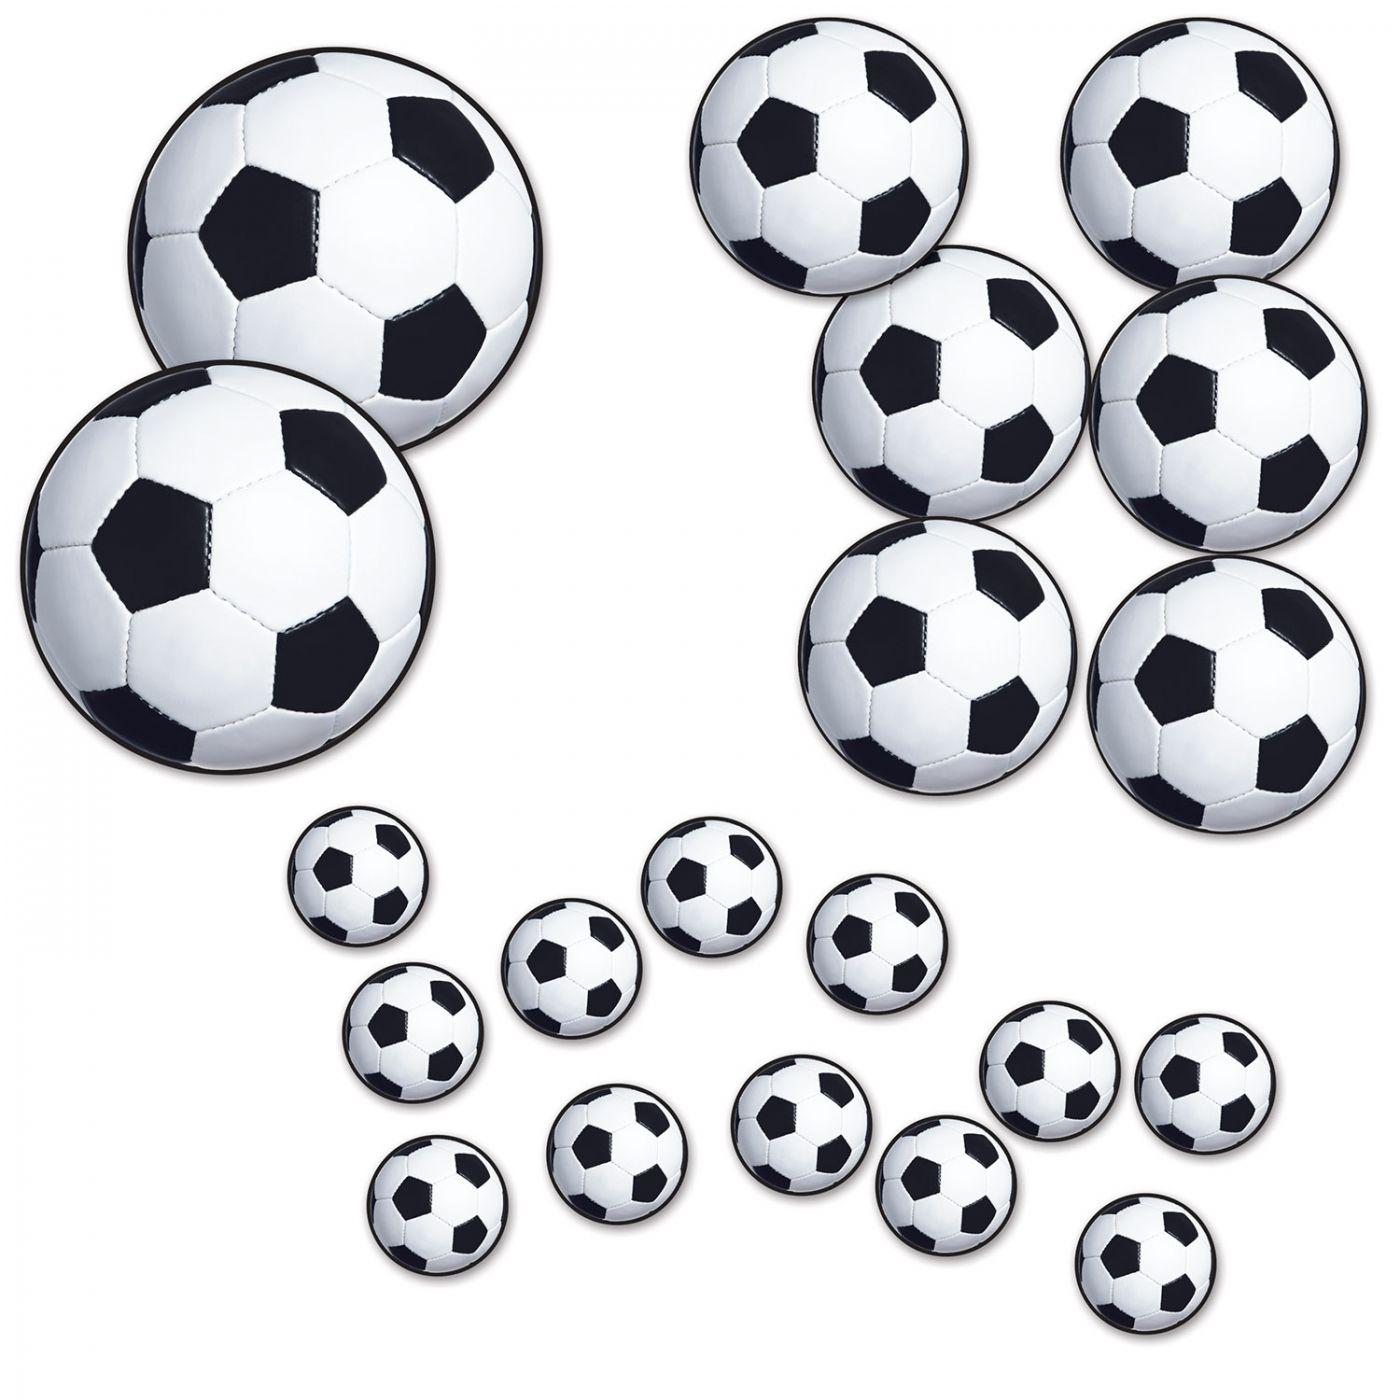 Soccer Ball Cutouts image